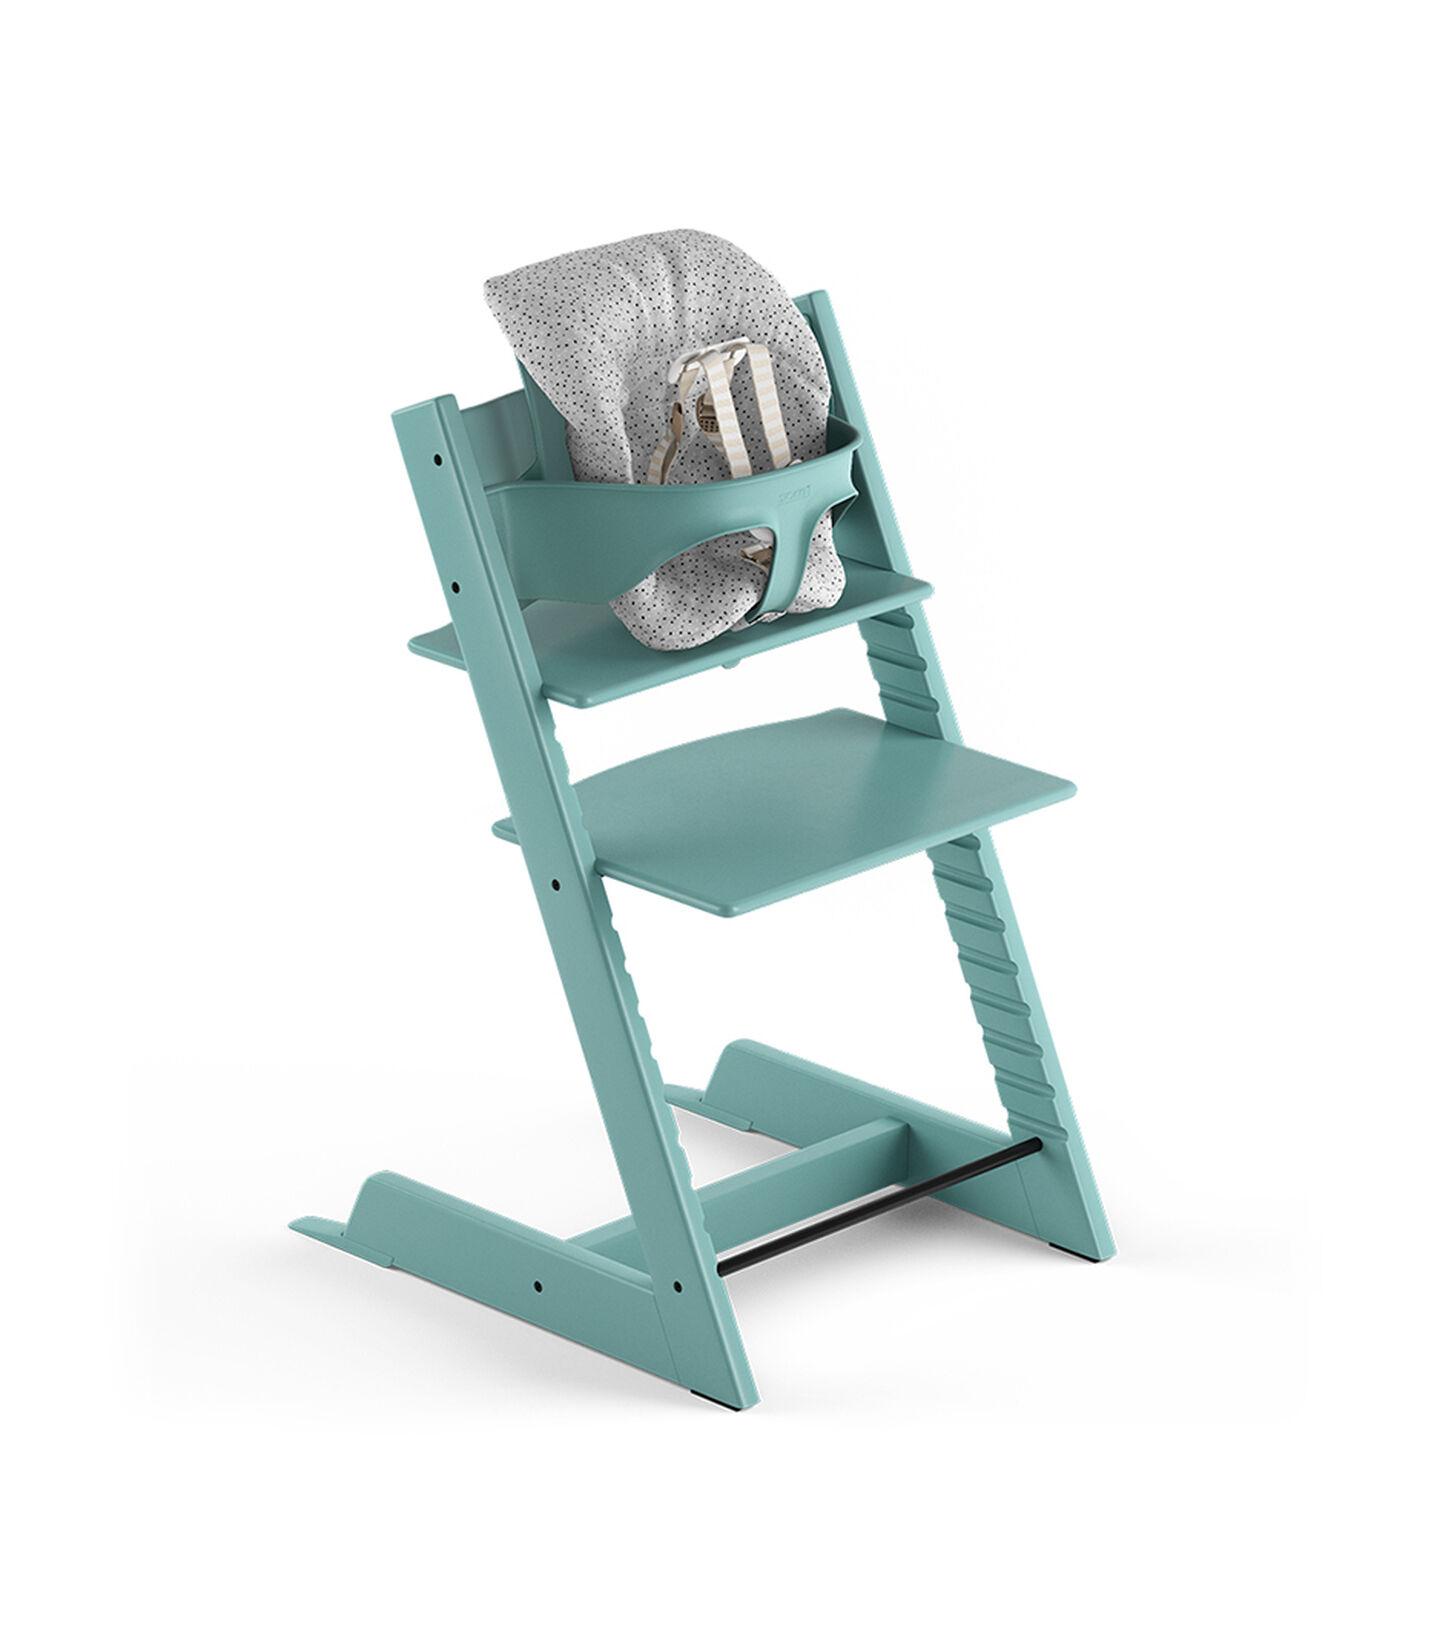 Tripp Tr Aqua Blue Beech With Baby Set And